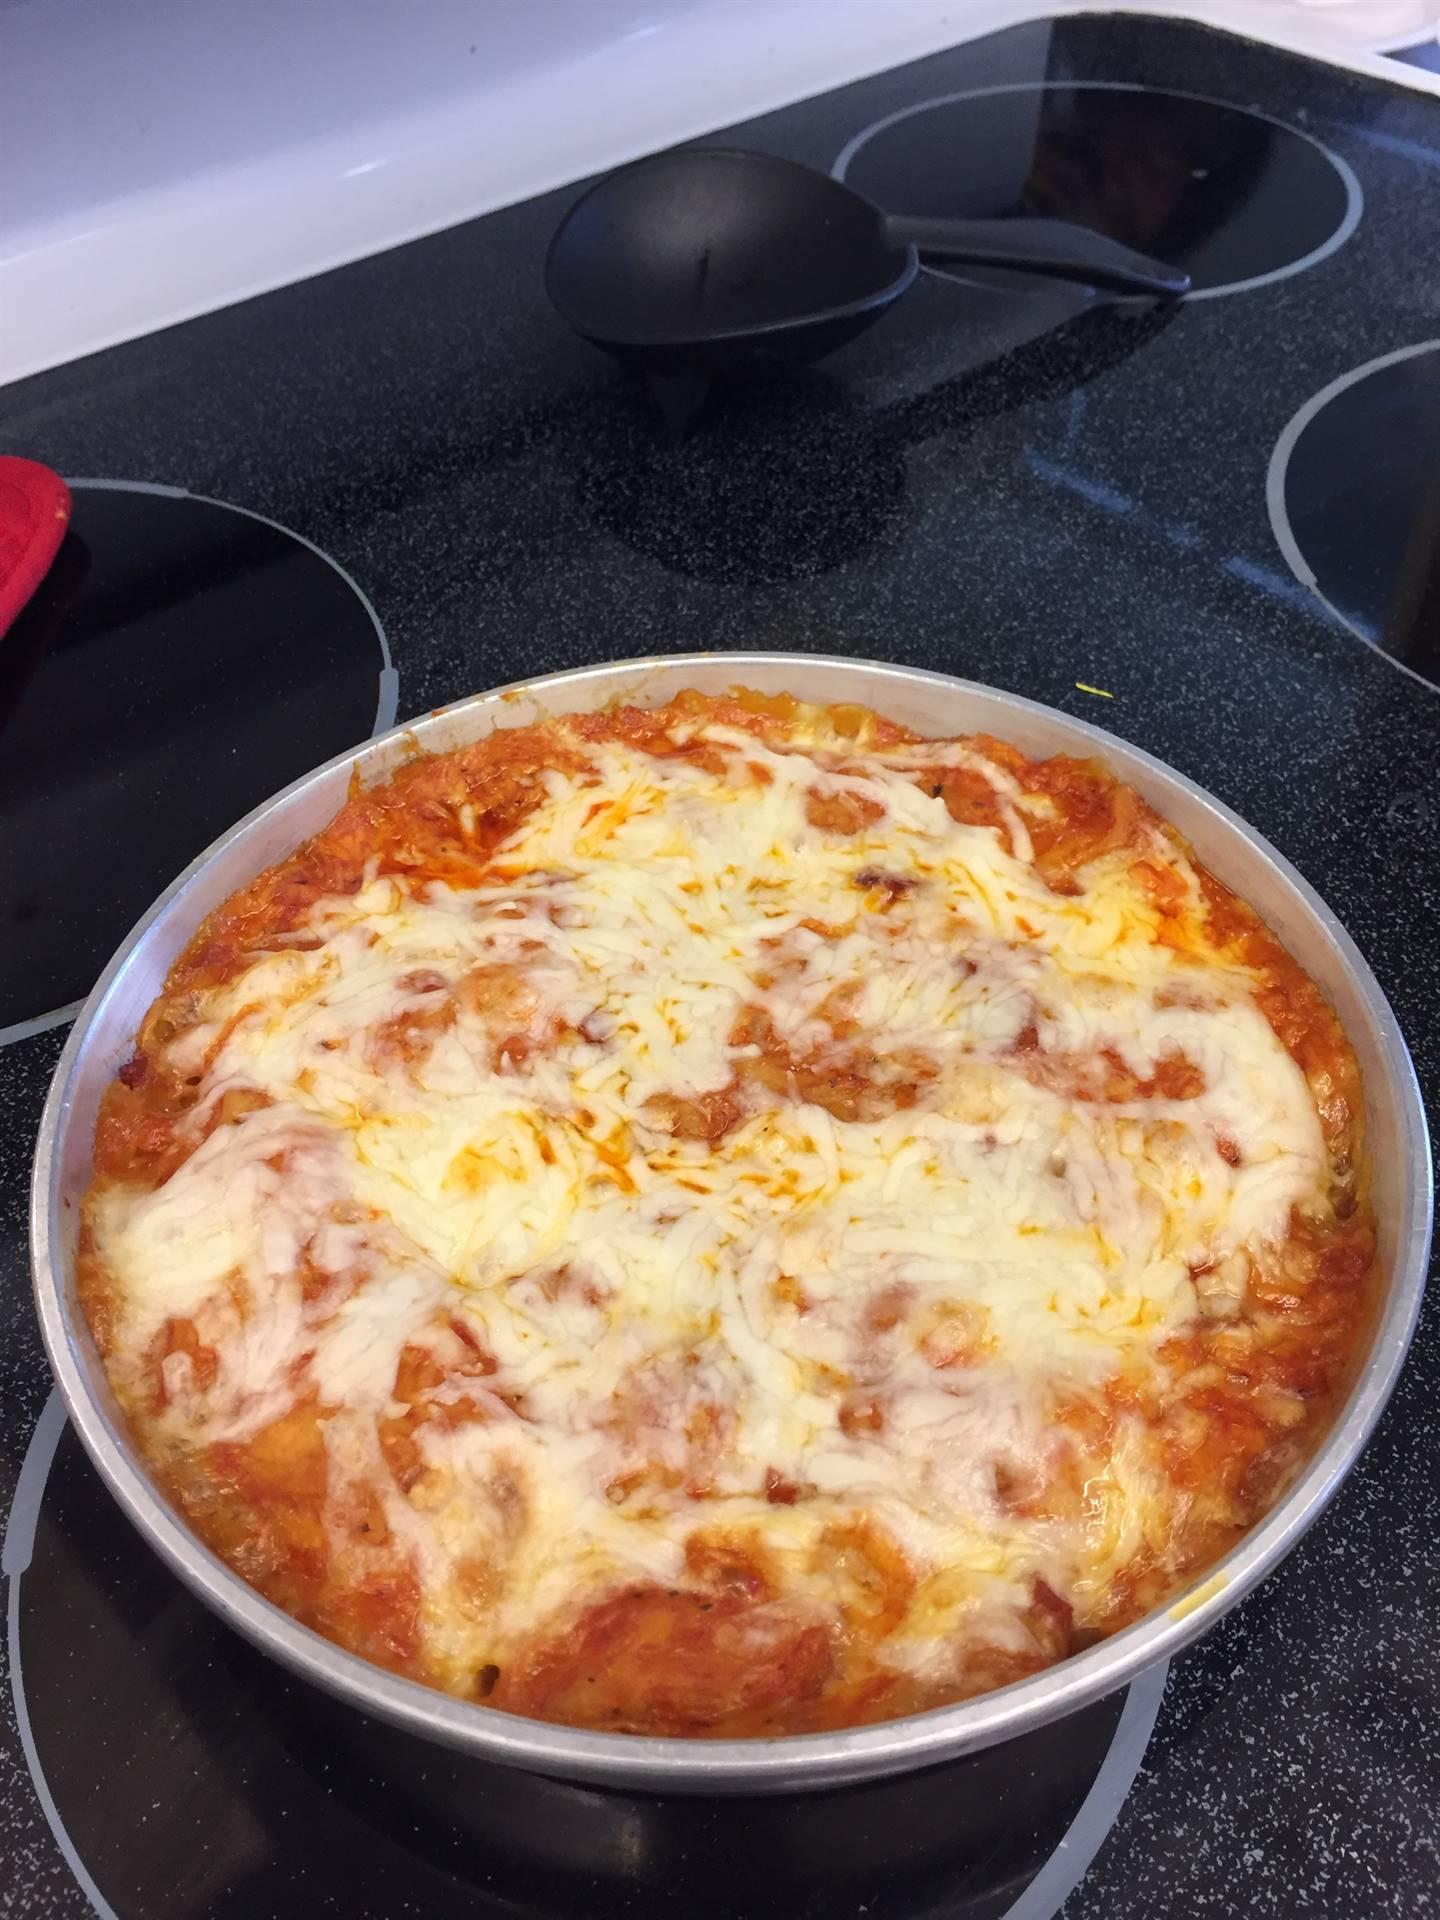 food tech students making pizza bubble bread